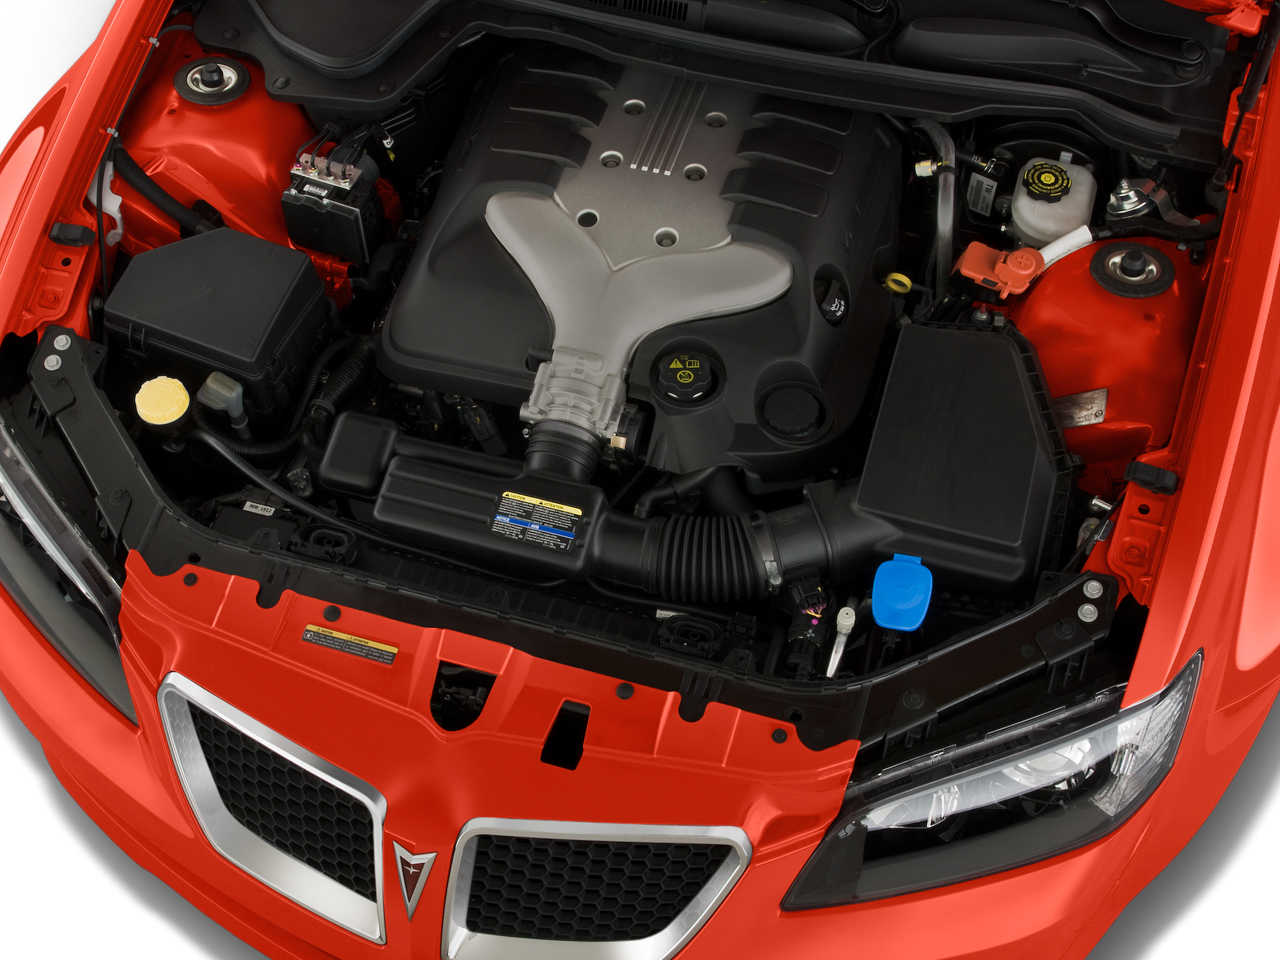 Pontiac G8 Engine Diagram Wiring Fuse Box Gt 2008 Sport Sedan Review Automobile Magazine Rh Automobilemag Com And Transmission